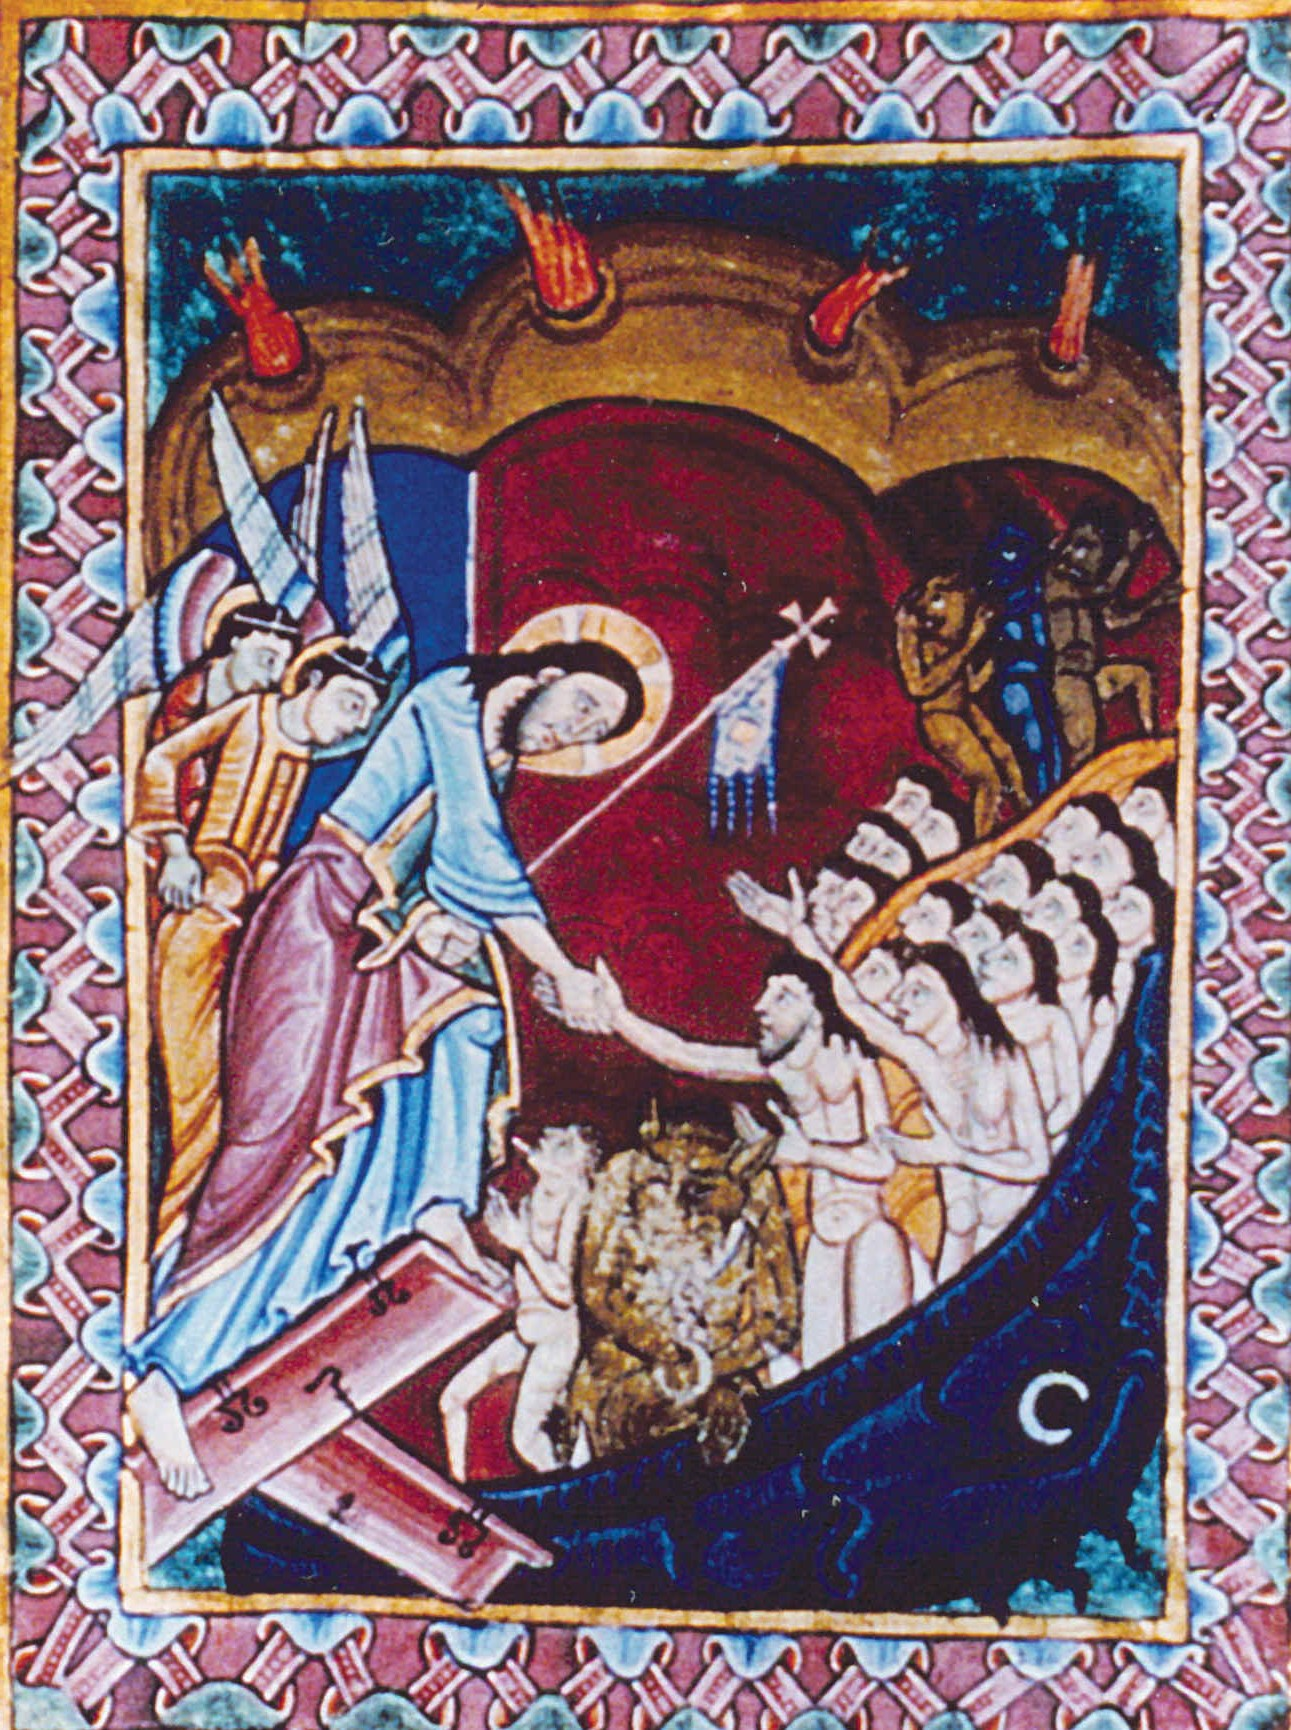 https://upload.wikimedia.org/wikipedia/commons/b/b1/Albani-Psalter_Abstieg_Christi_ins_Totenreich.jpg